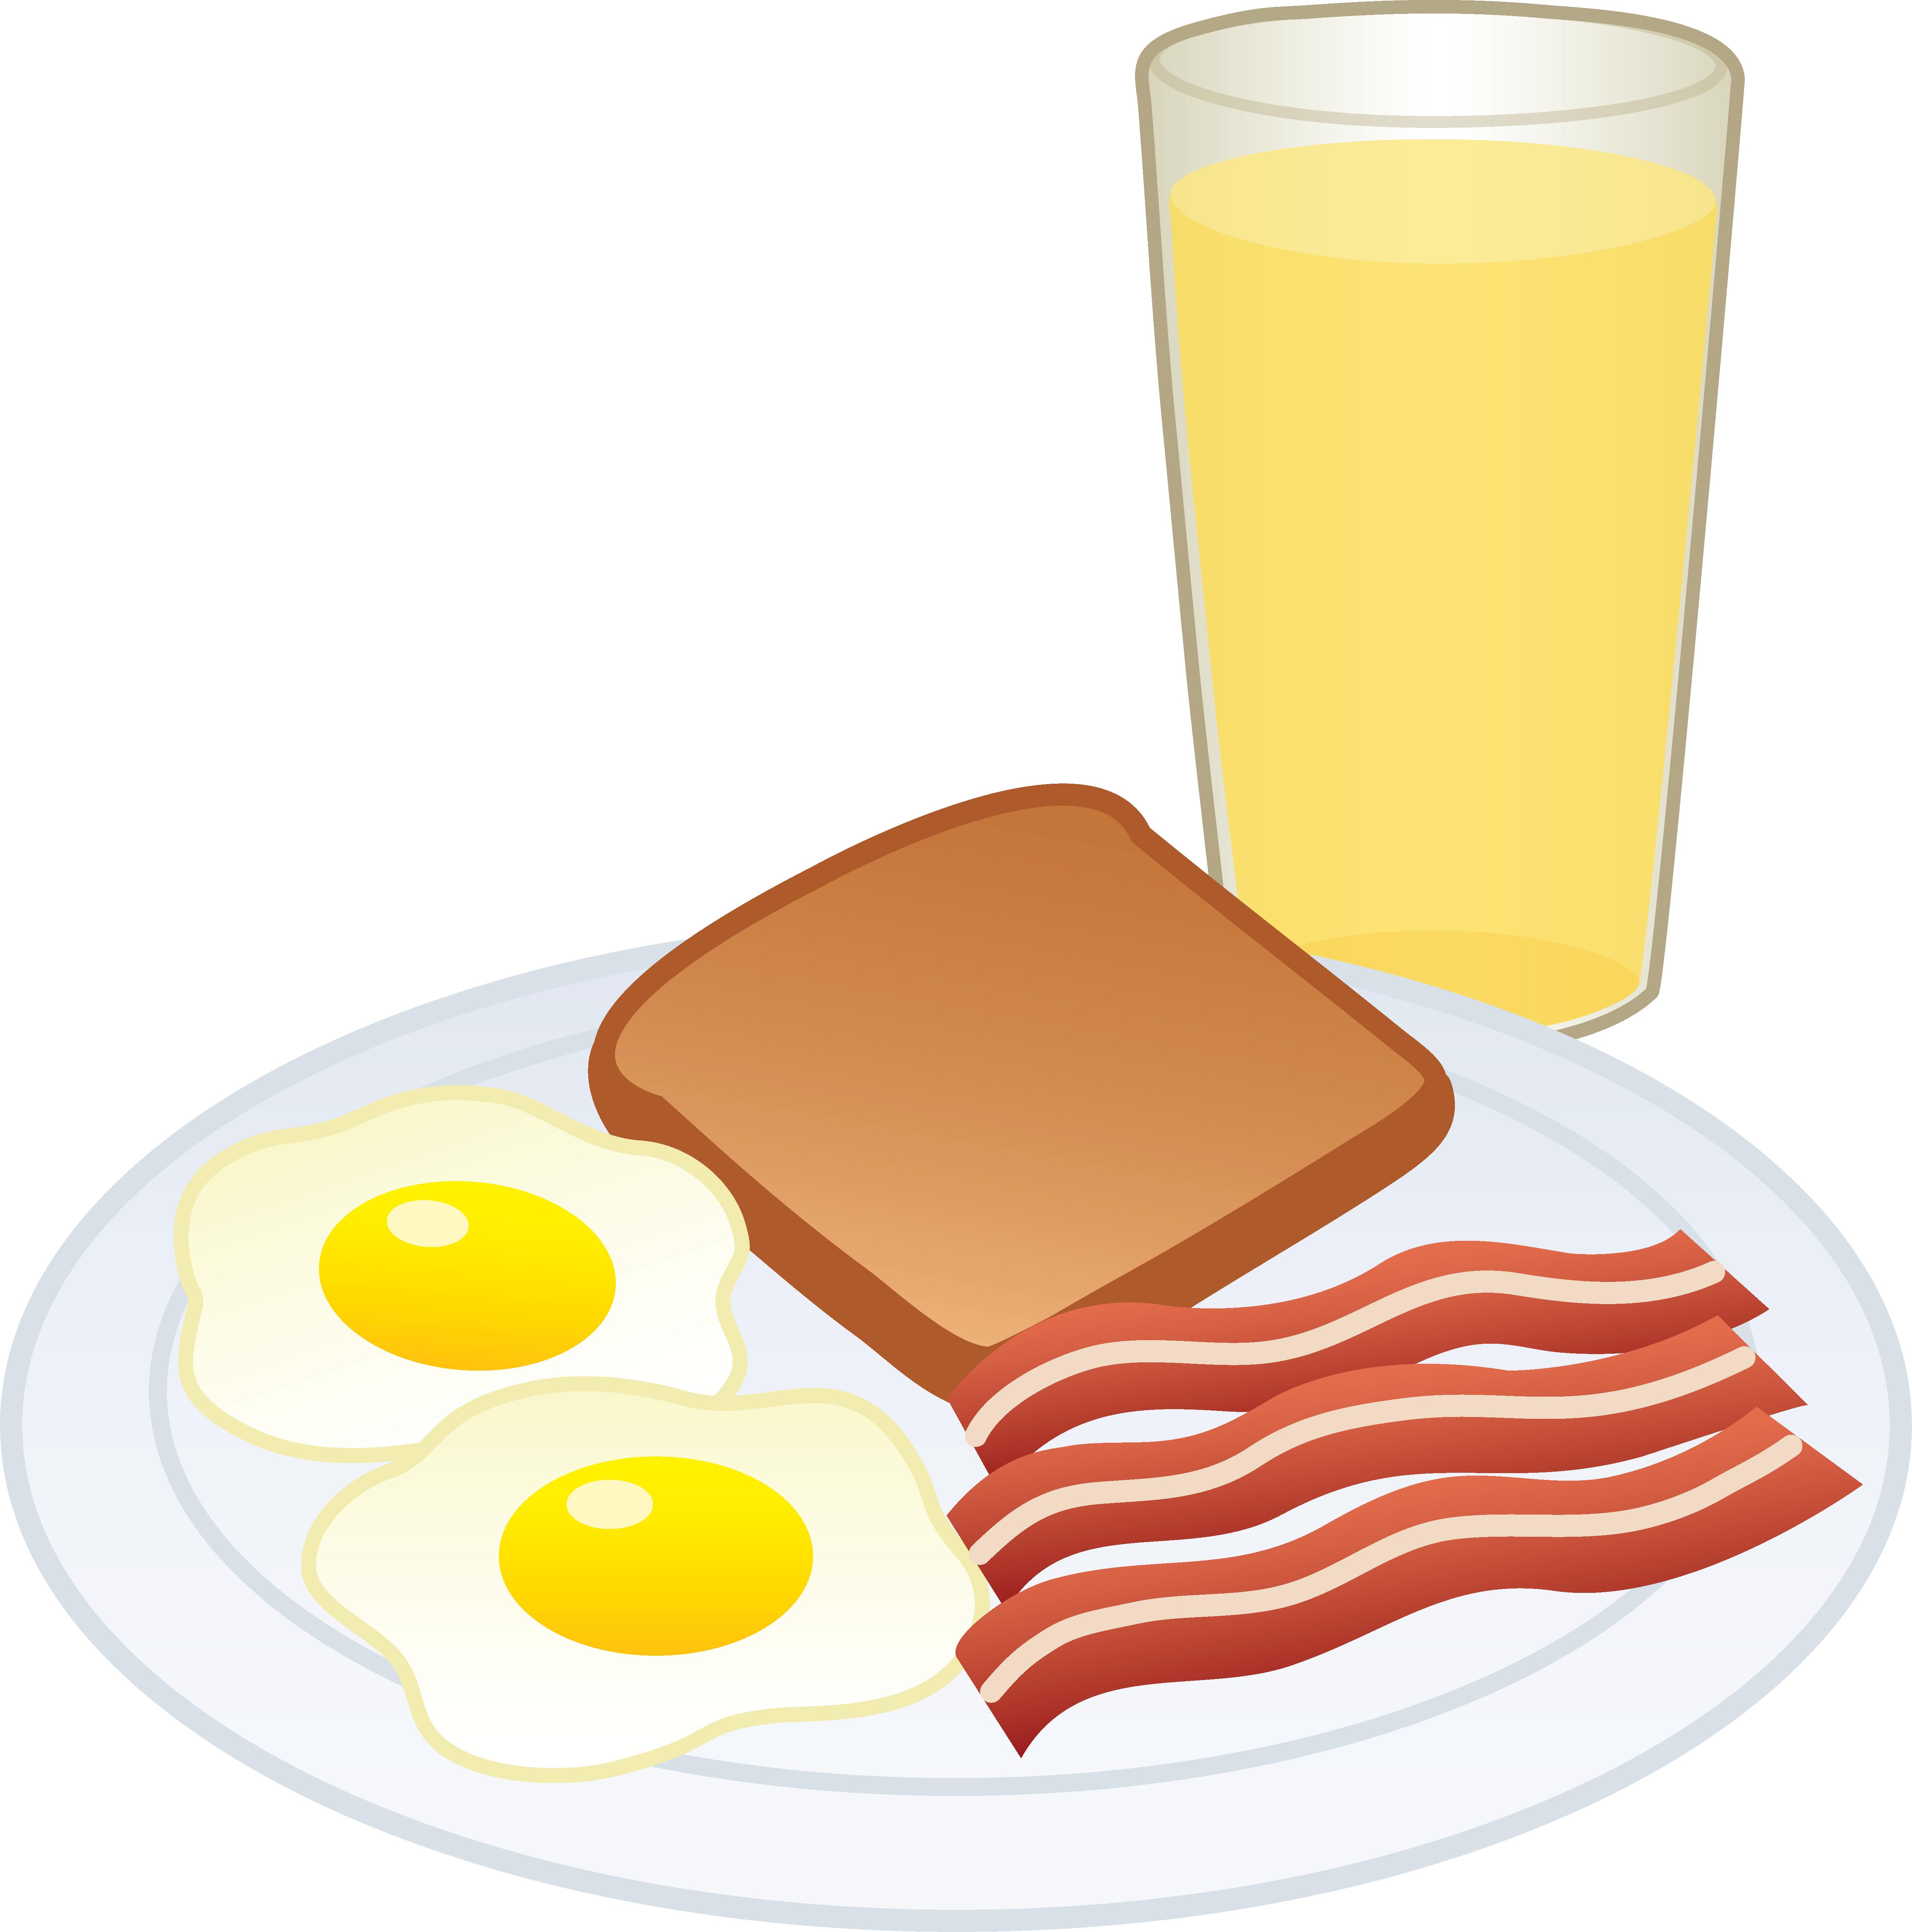 5350x5406 Pancake Clipart Breakfast Plate